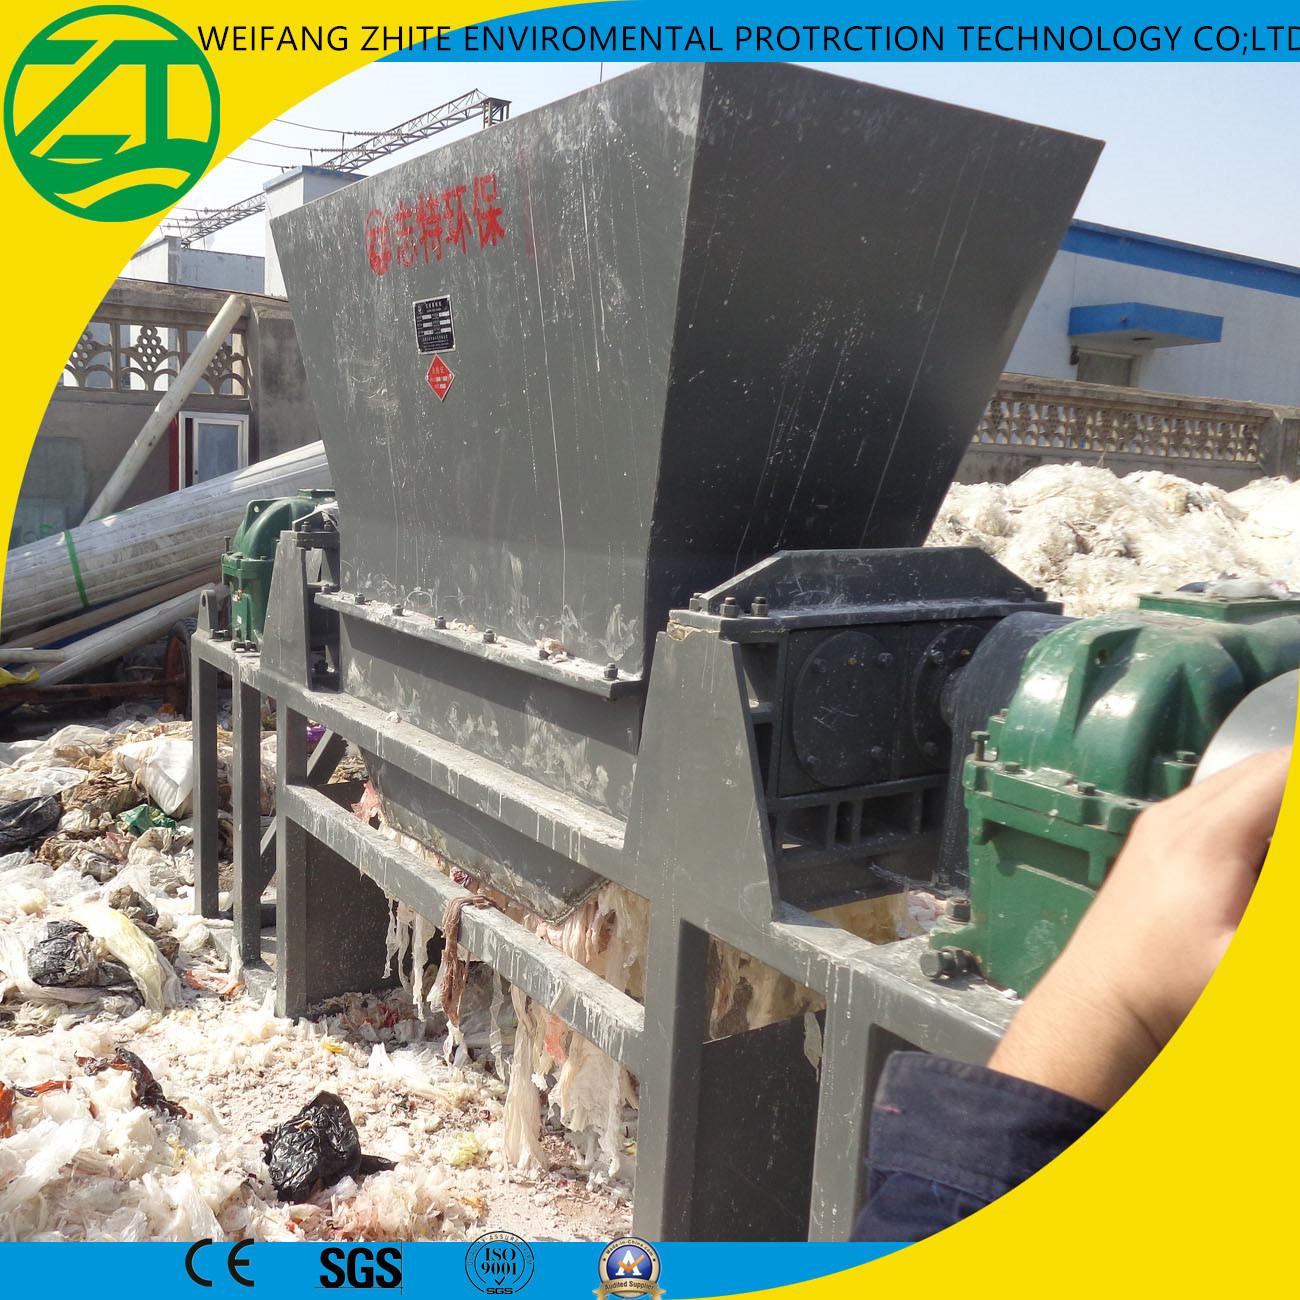 Waste Tire Recycling/Rubber/Municipal Waste/Foam/Waste Fabric/Scrap Metal/Wood/Plastic Shredder